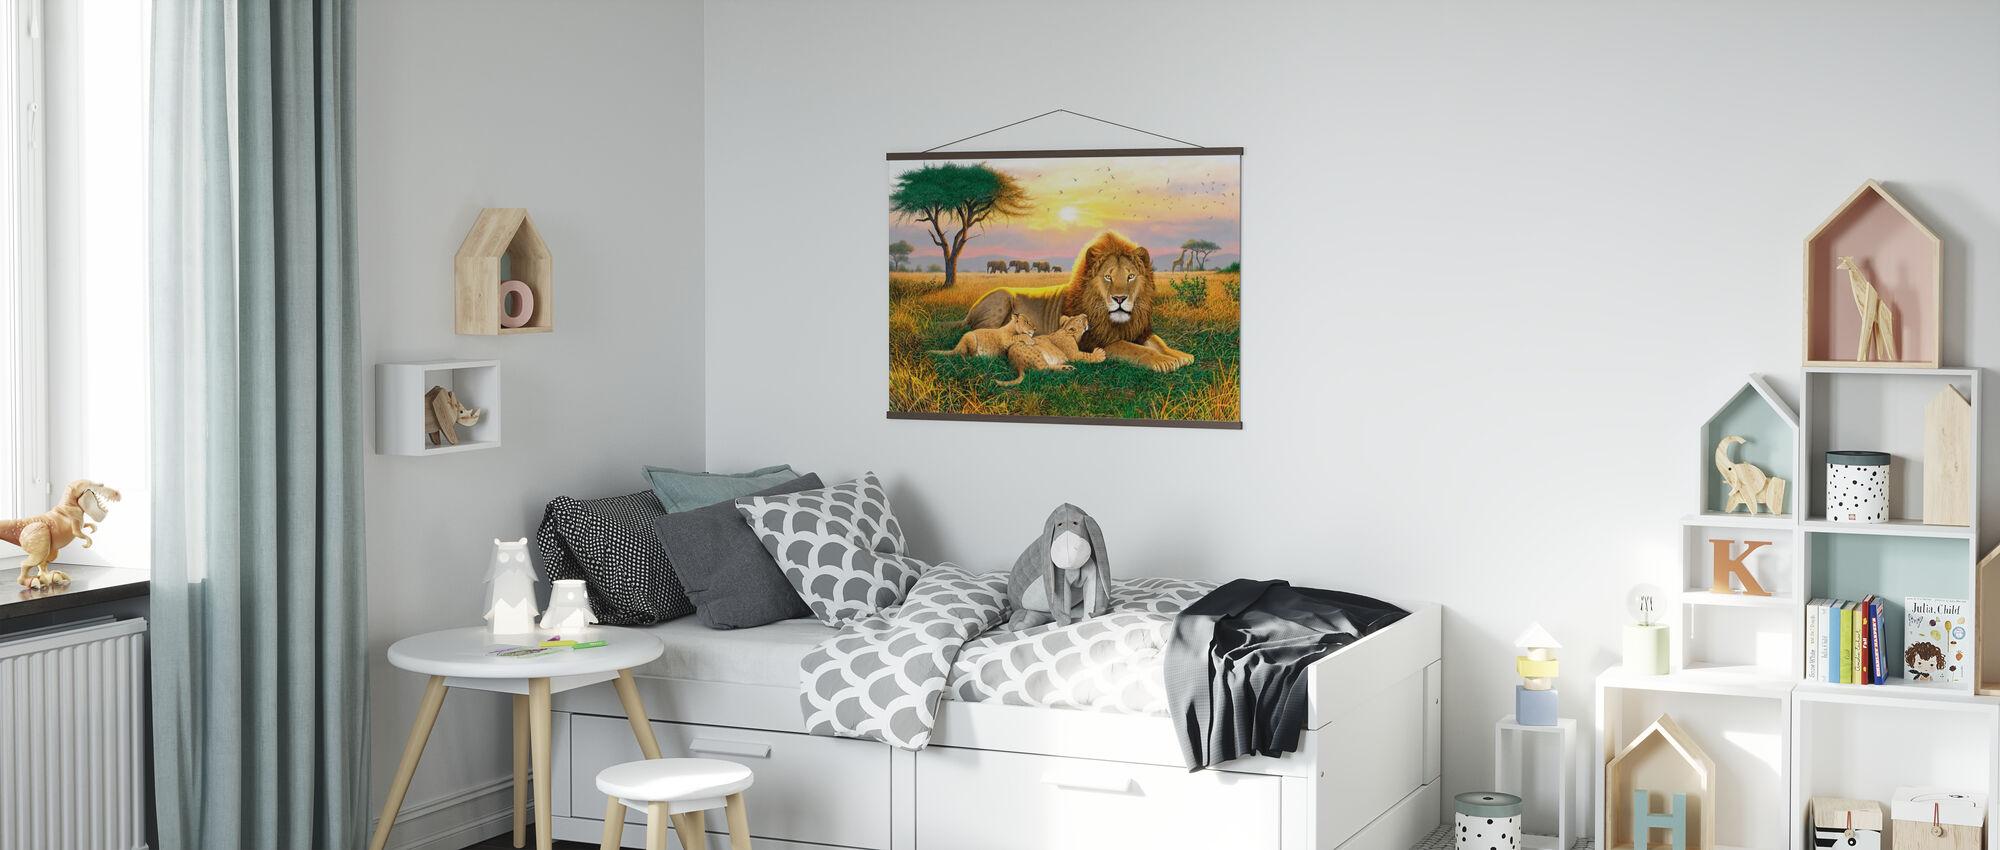 Koningen van de Serengeti - Poster - Kinderkamer